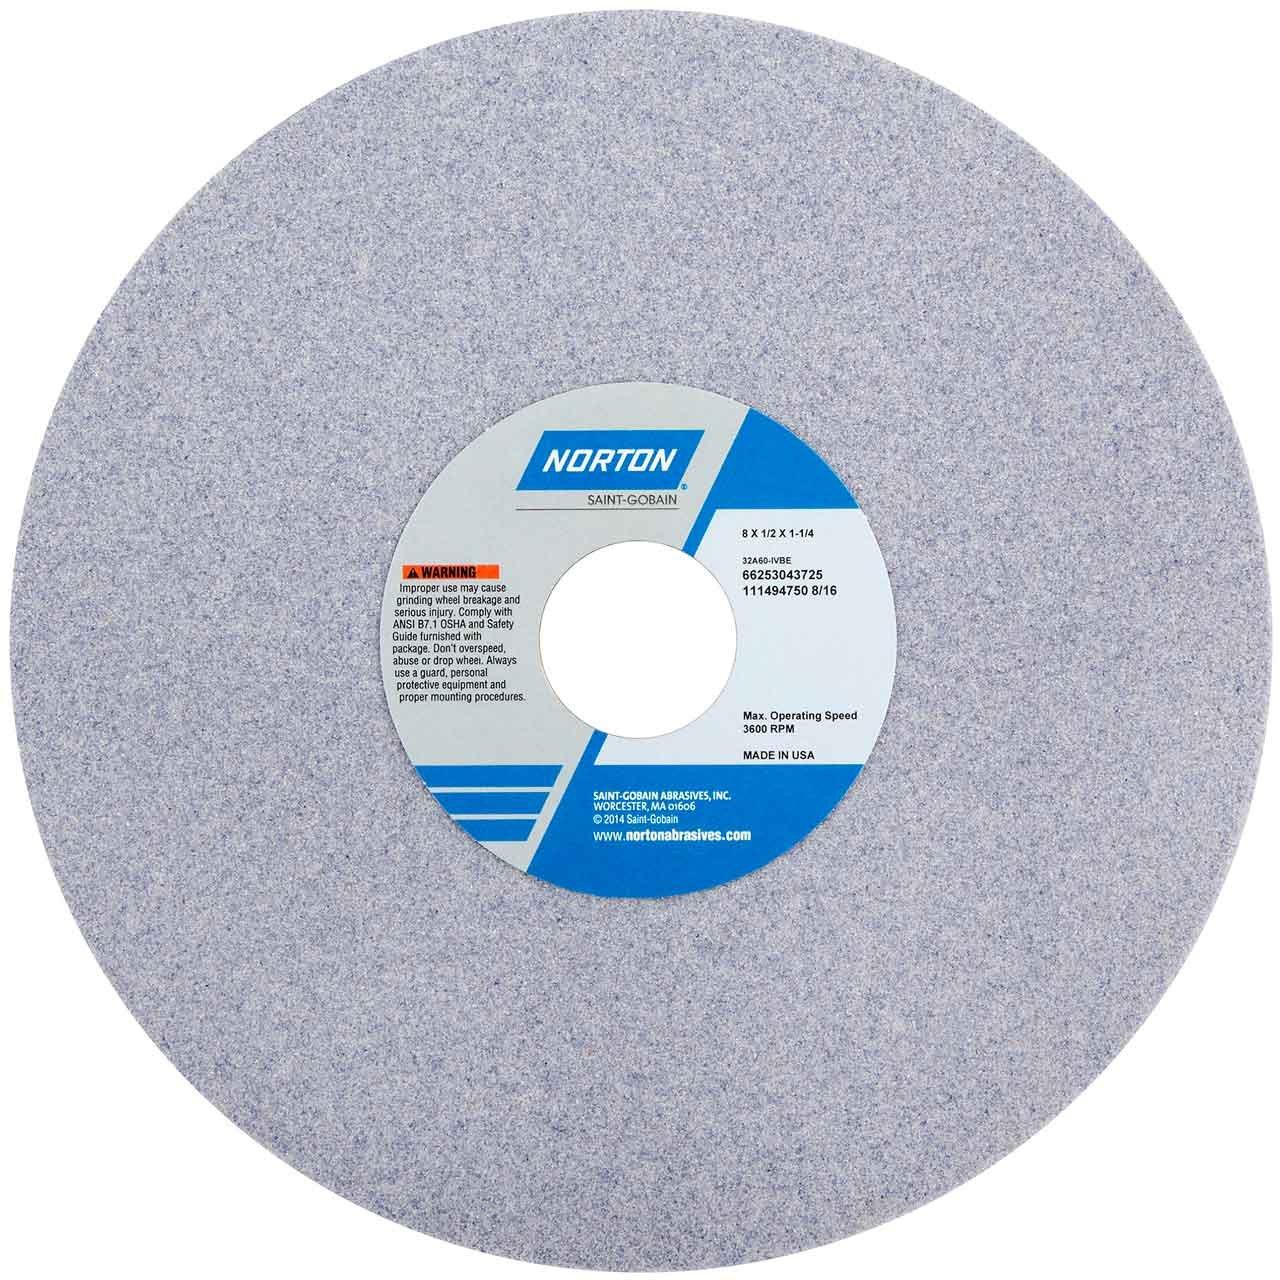 Norton 32A46-JVBE Type 01 Vitrified Straight Toolroom Grinding Wheel, Aluminum Oxide, 8'' Diameter x 1/2'' Width, 1-1/4'' Arbor, 46 Grit, Grade J, Purple (Pack of 1)